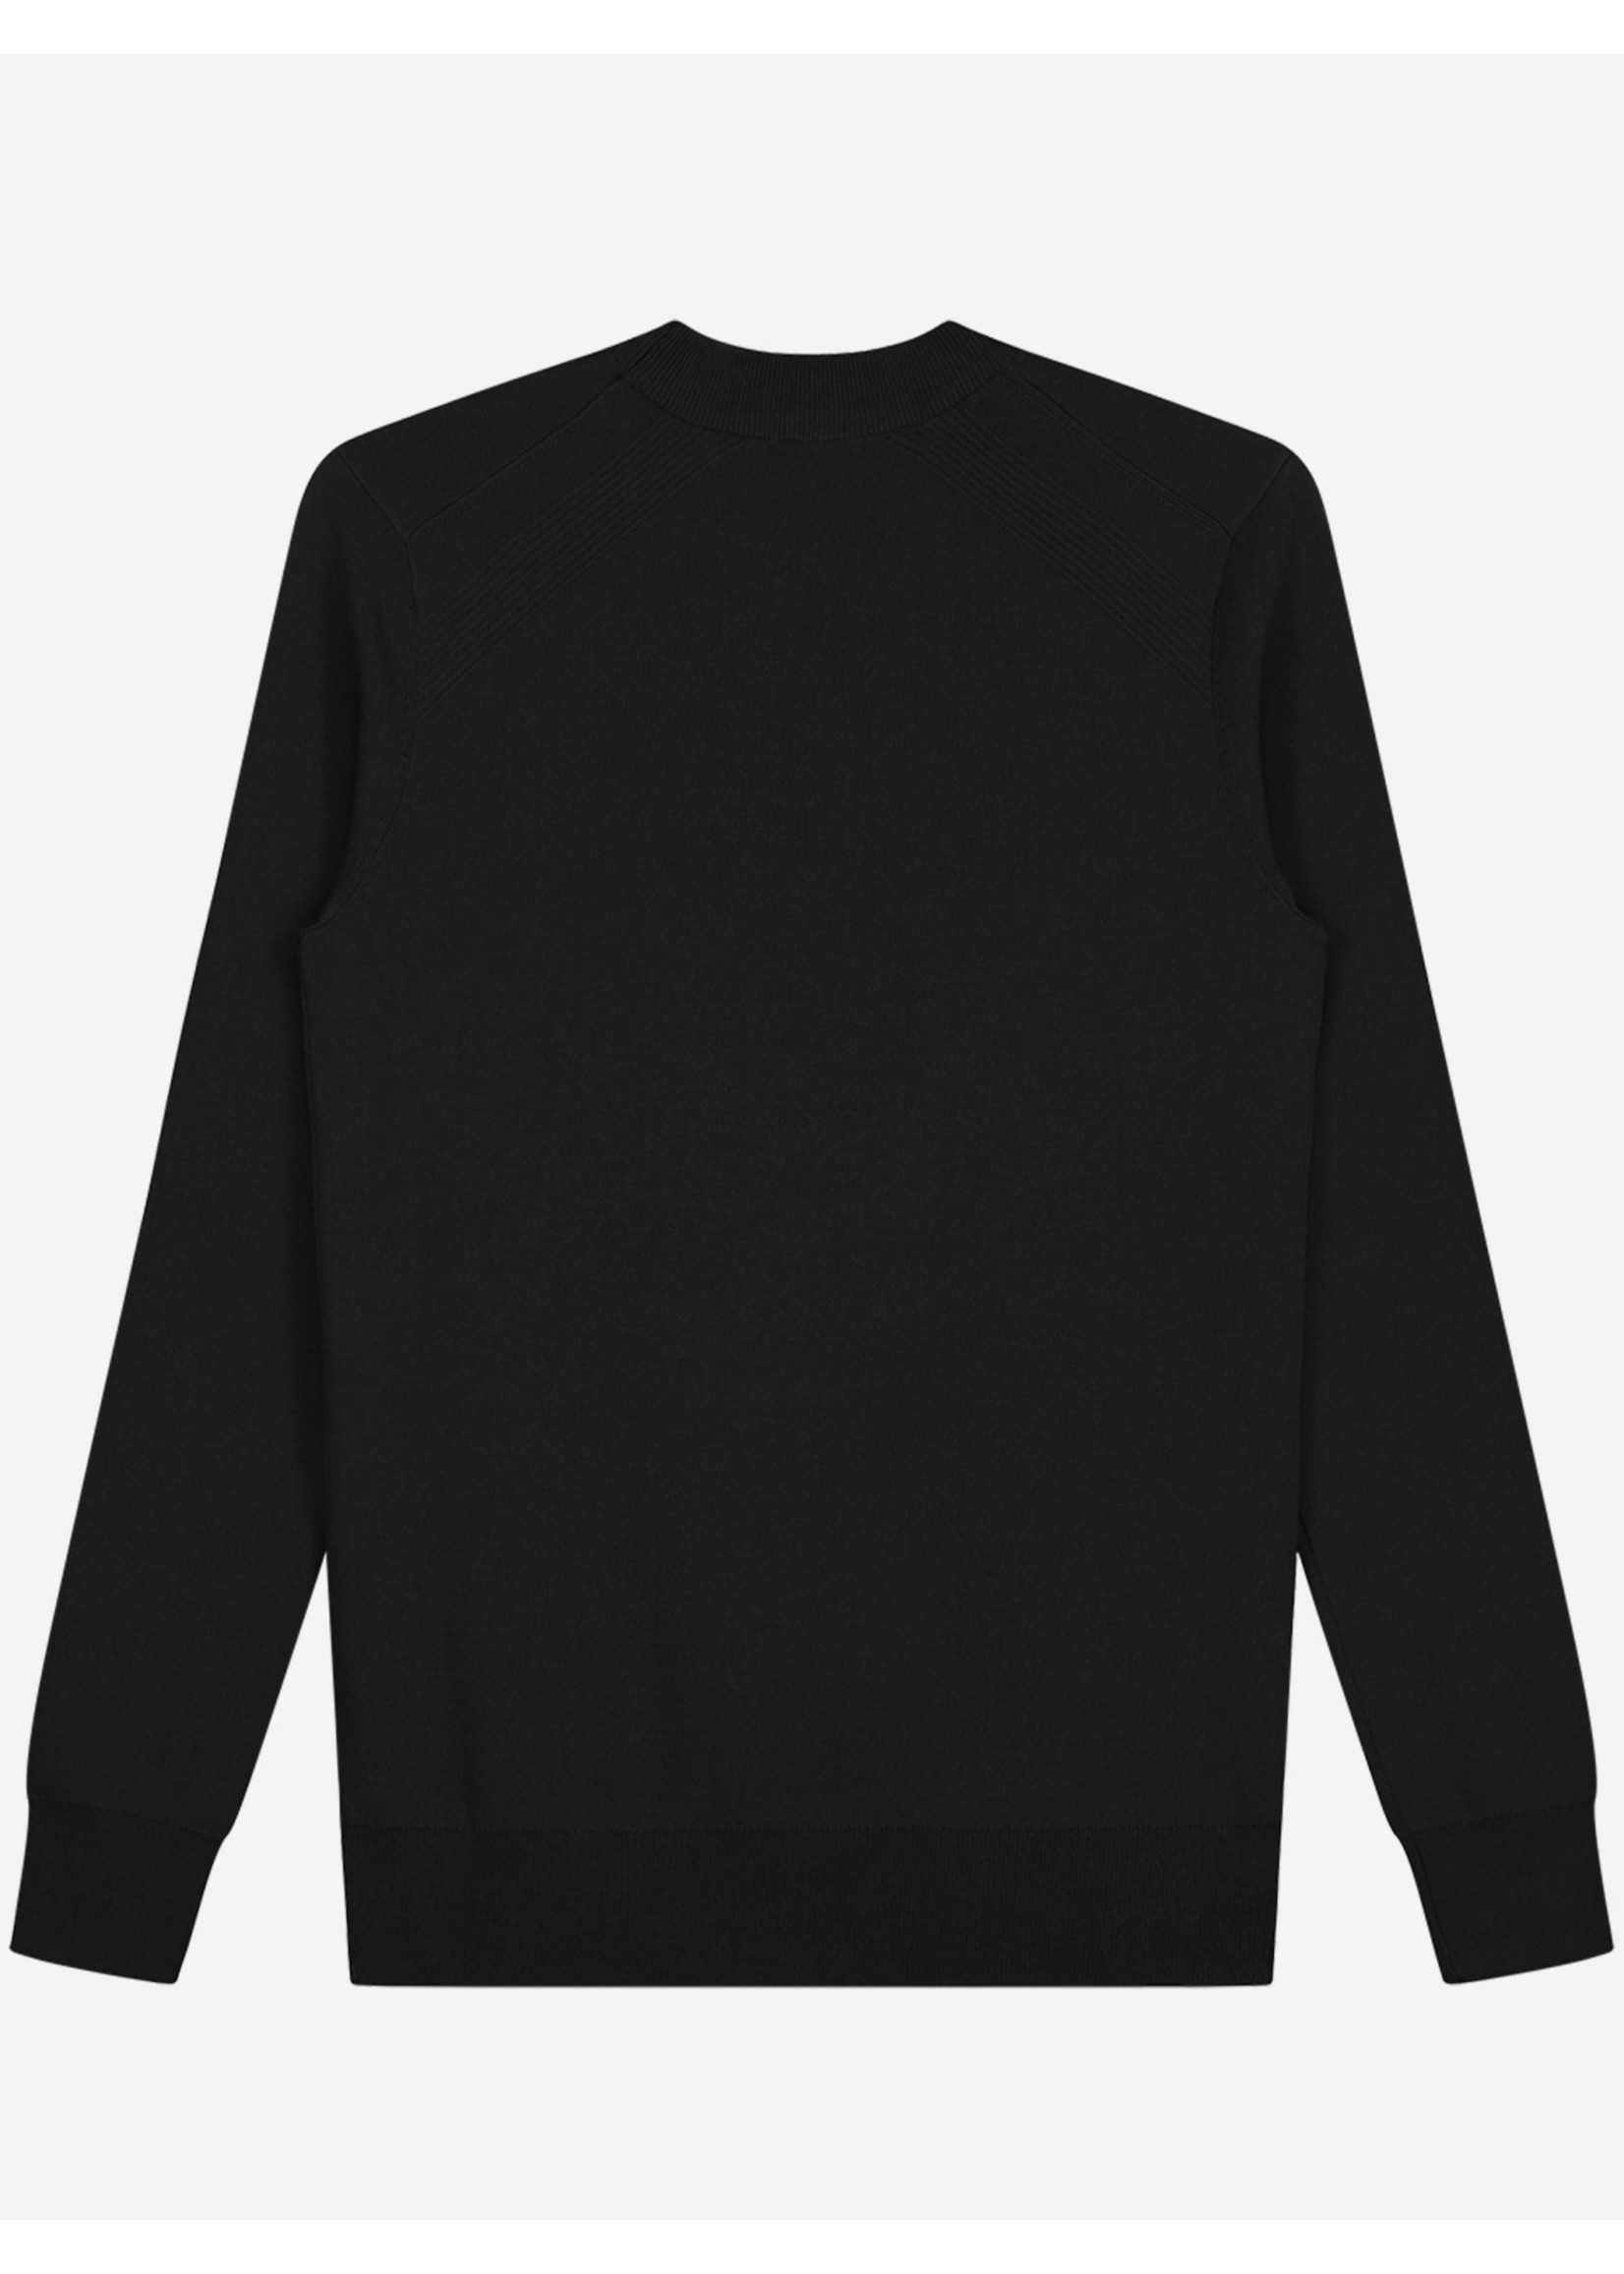 Sustain Sustain Reverse Crewneck Knit - Black